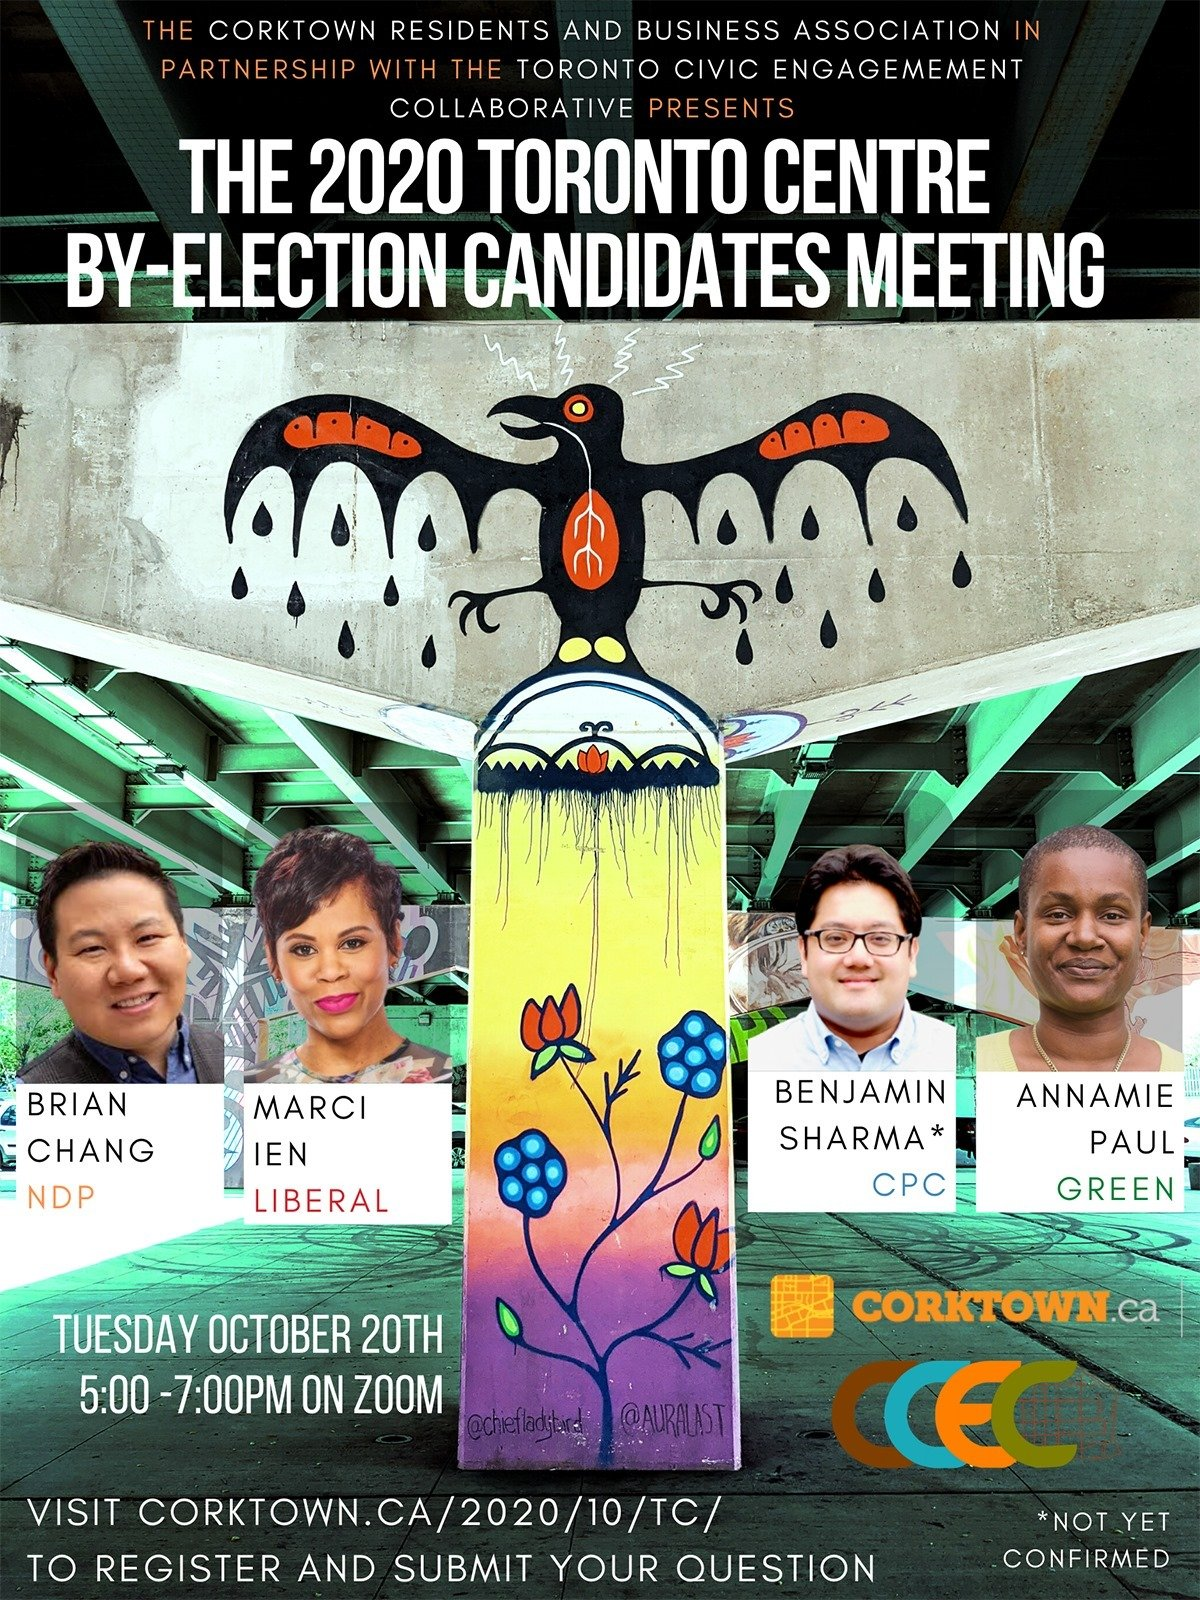 2020_Toronto_Centre_Corktown_RA_and_BIA_Candidates_Meeting.jpg